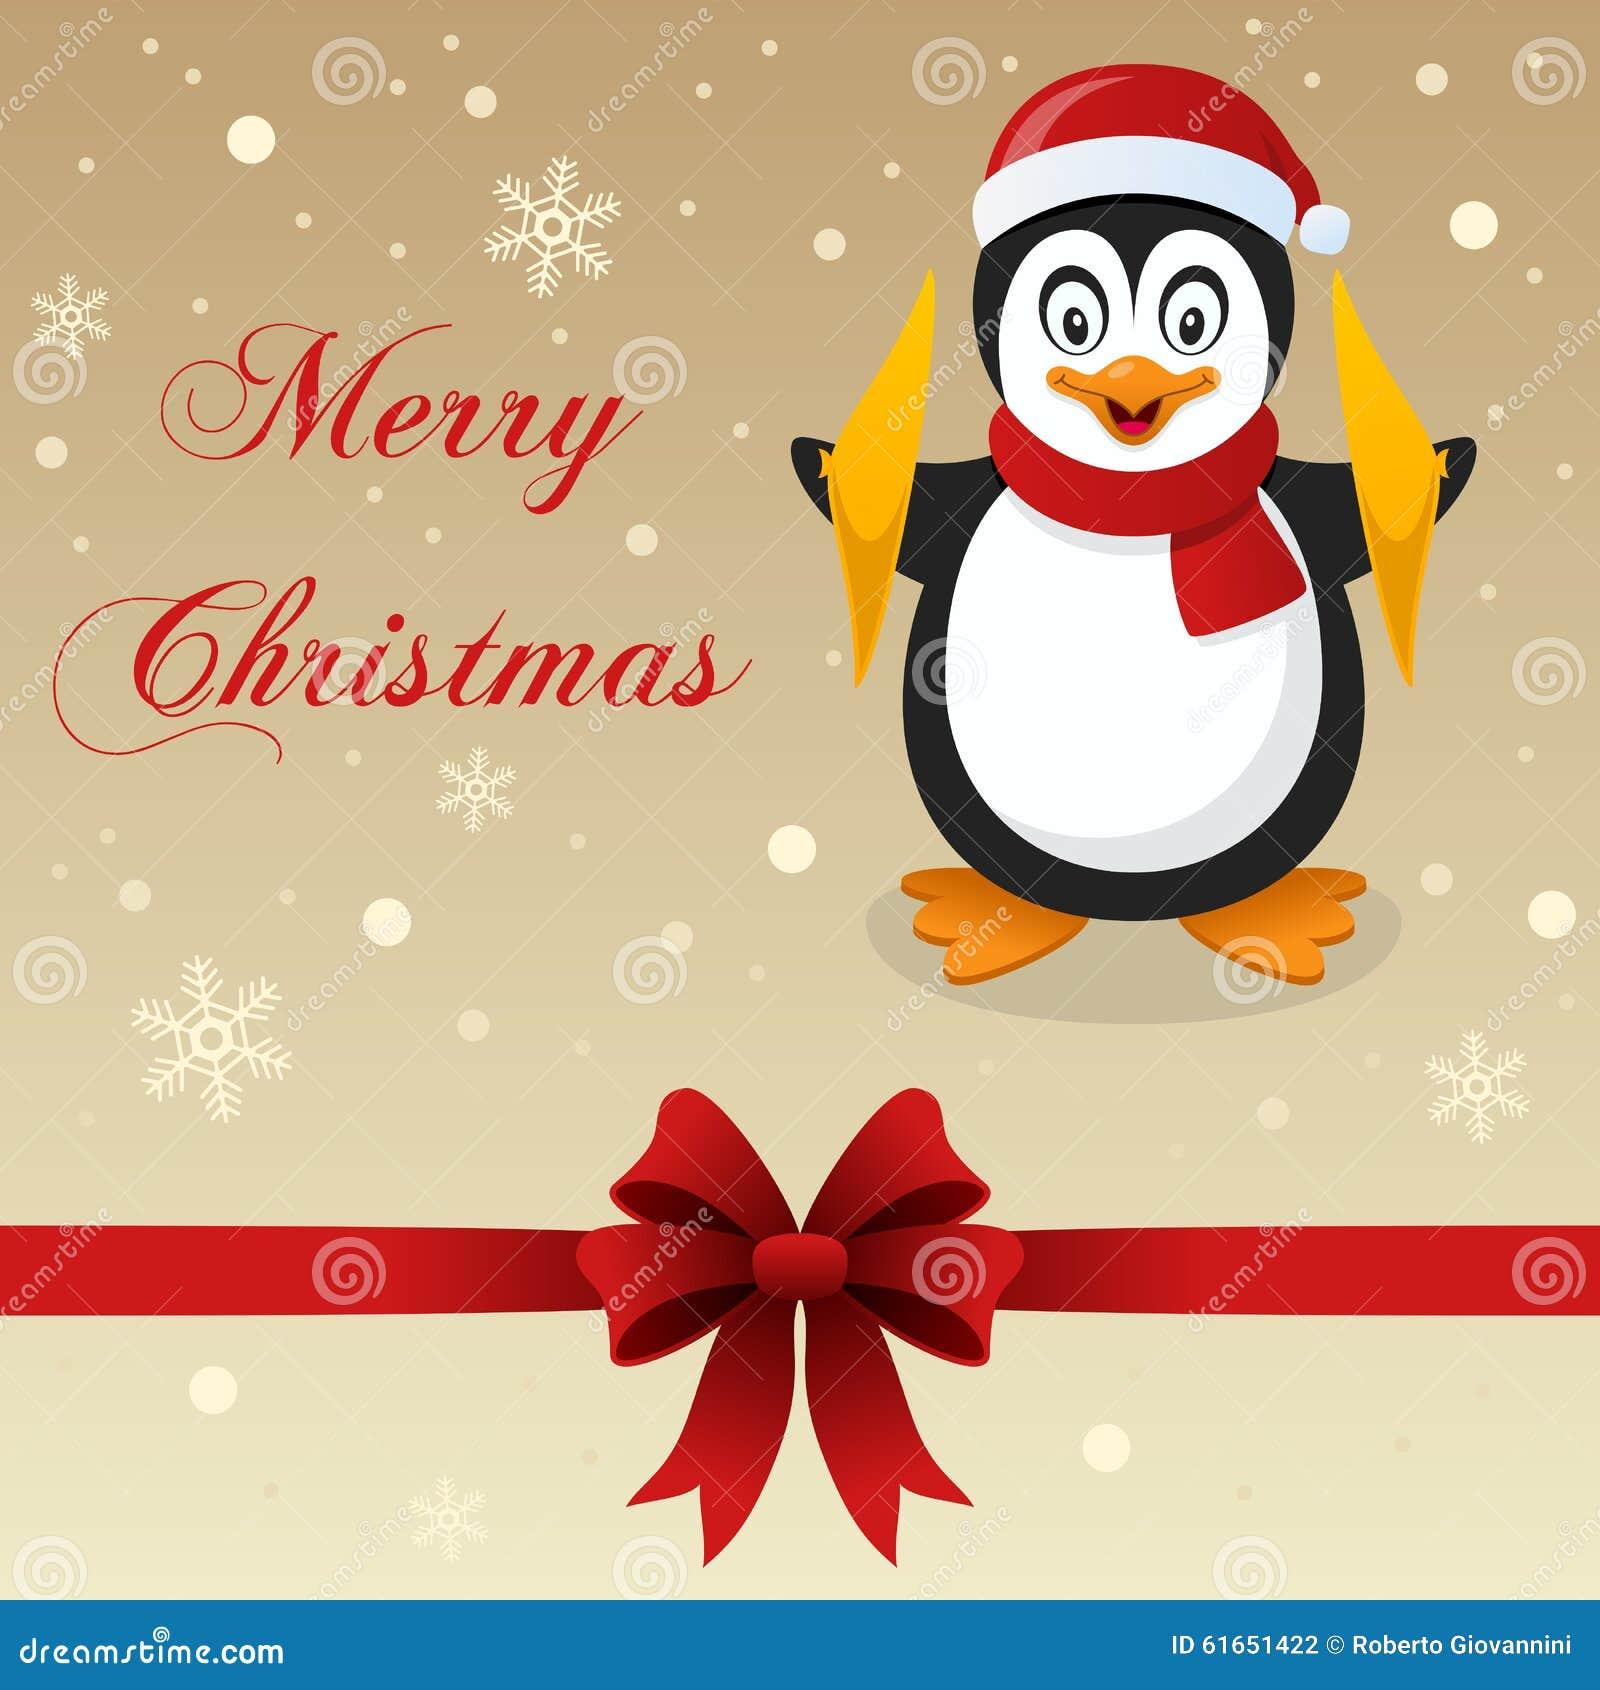 retro merry christmas card penguin stock vector image 61651422. Black Bedroom Furniture Sets. Home Design Ideas